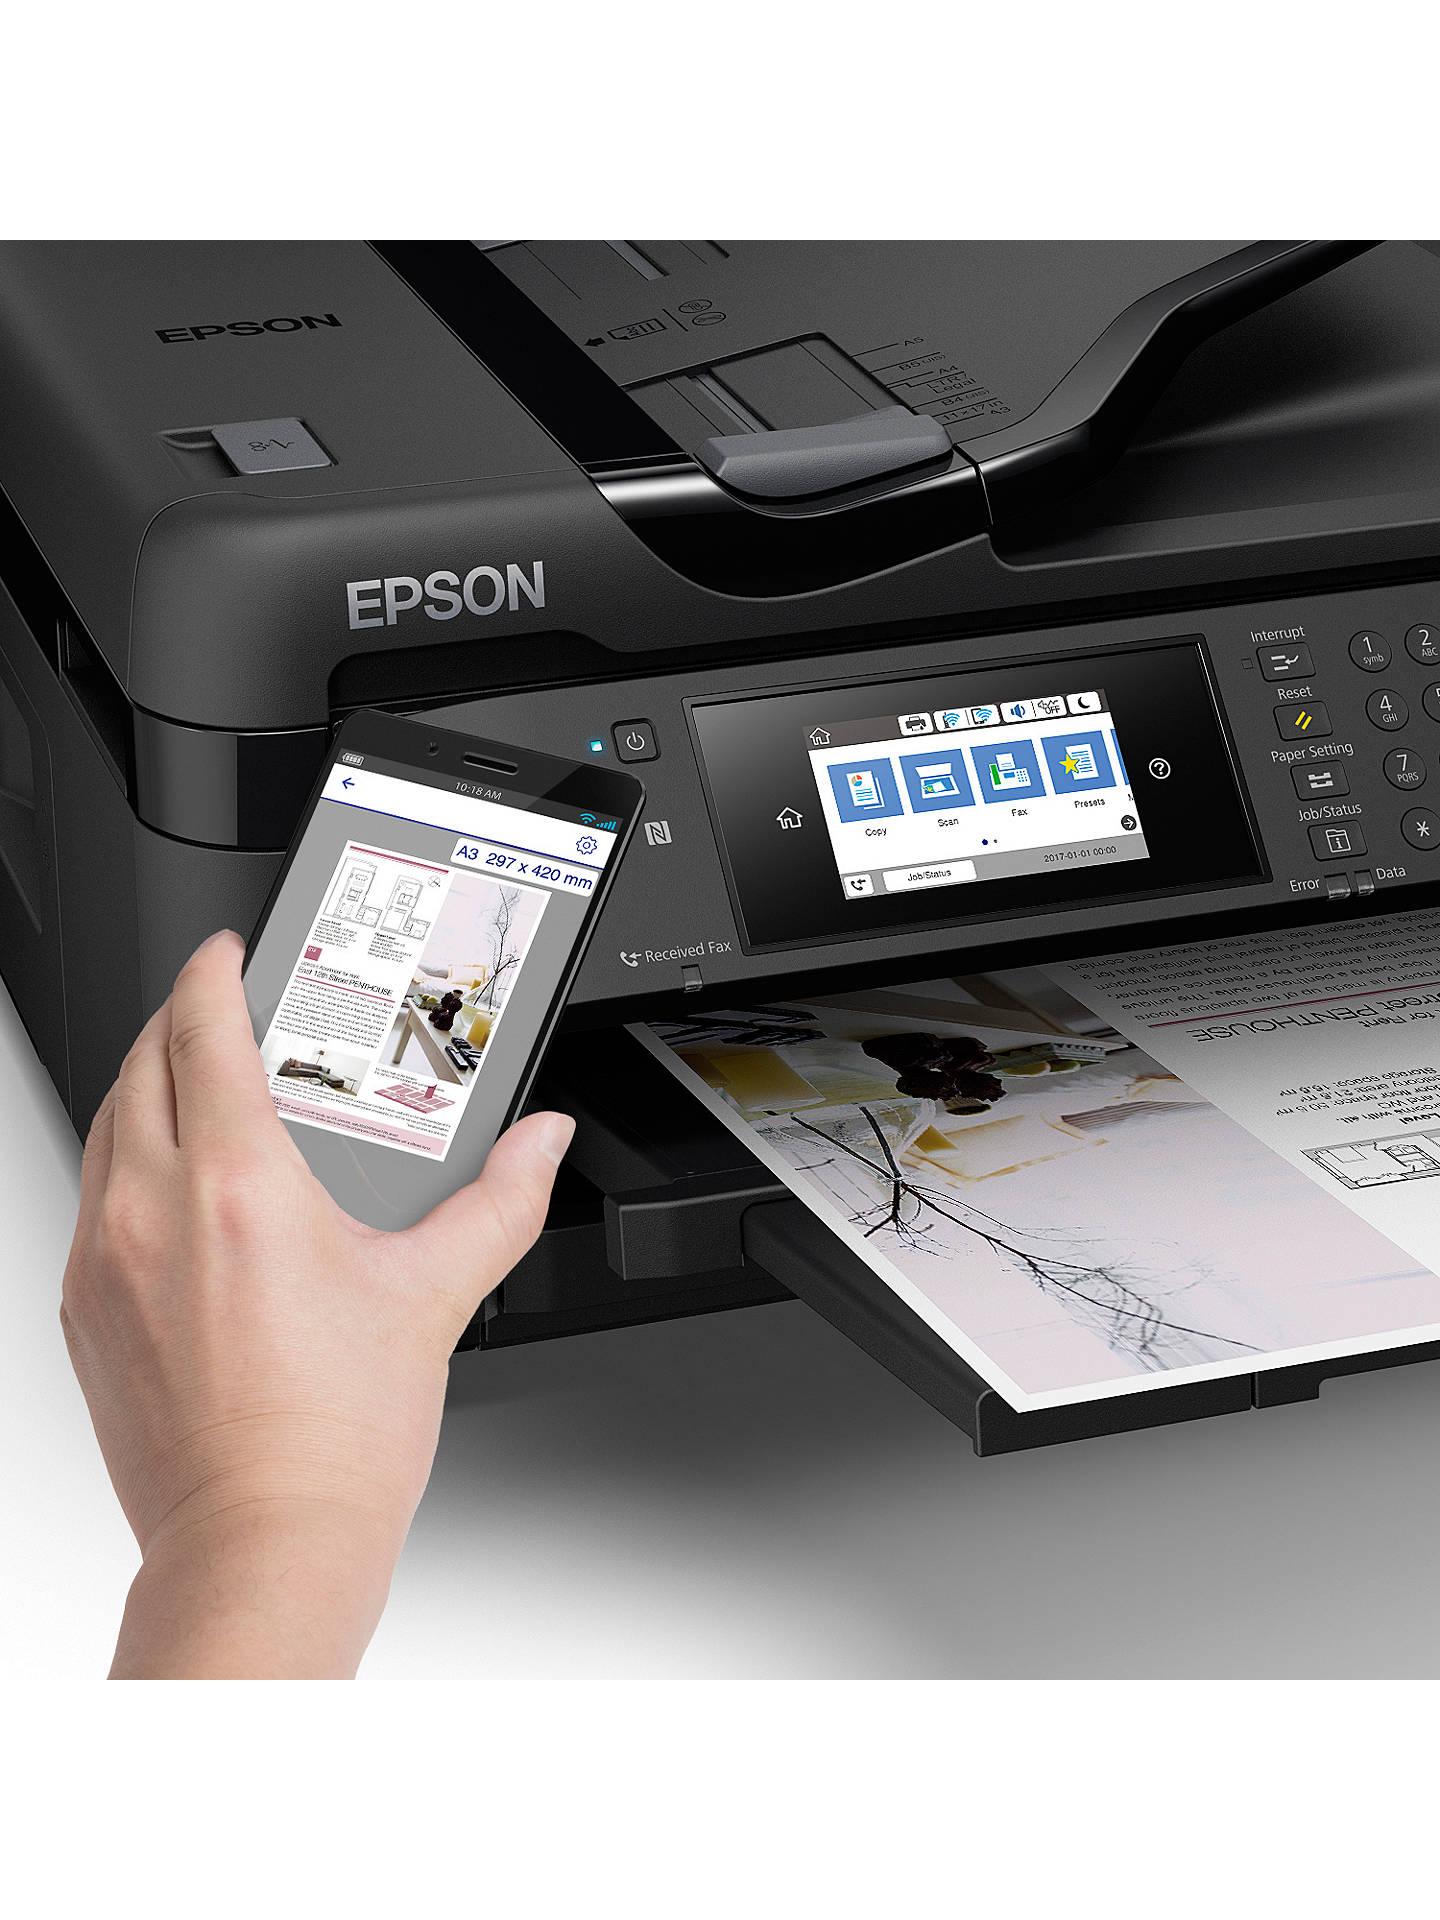 Epson Workforce Wf 7710 All In One A3 Wireless Printer Black At Install Diagram Buyepson Online